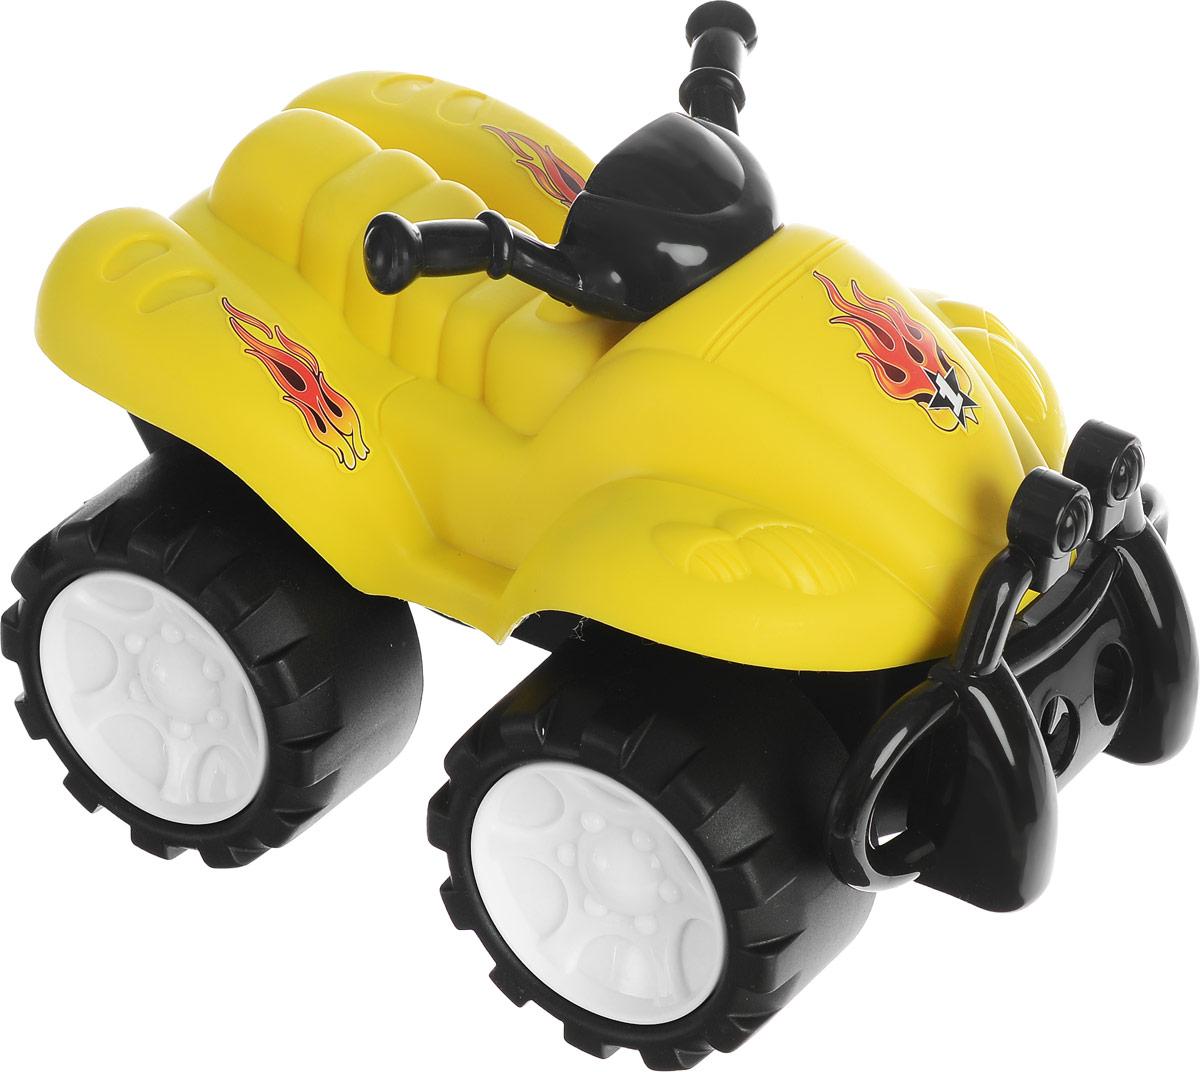 Keenway Машинка-игрушка Big Wheels цвет желтый - Транспорт, машинки